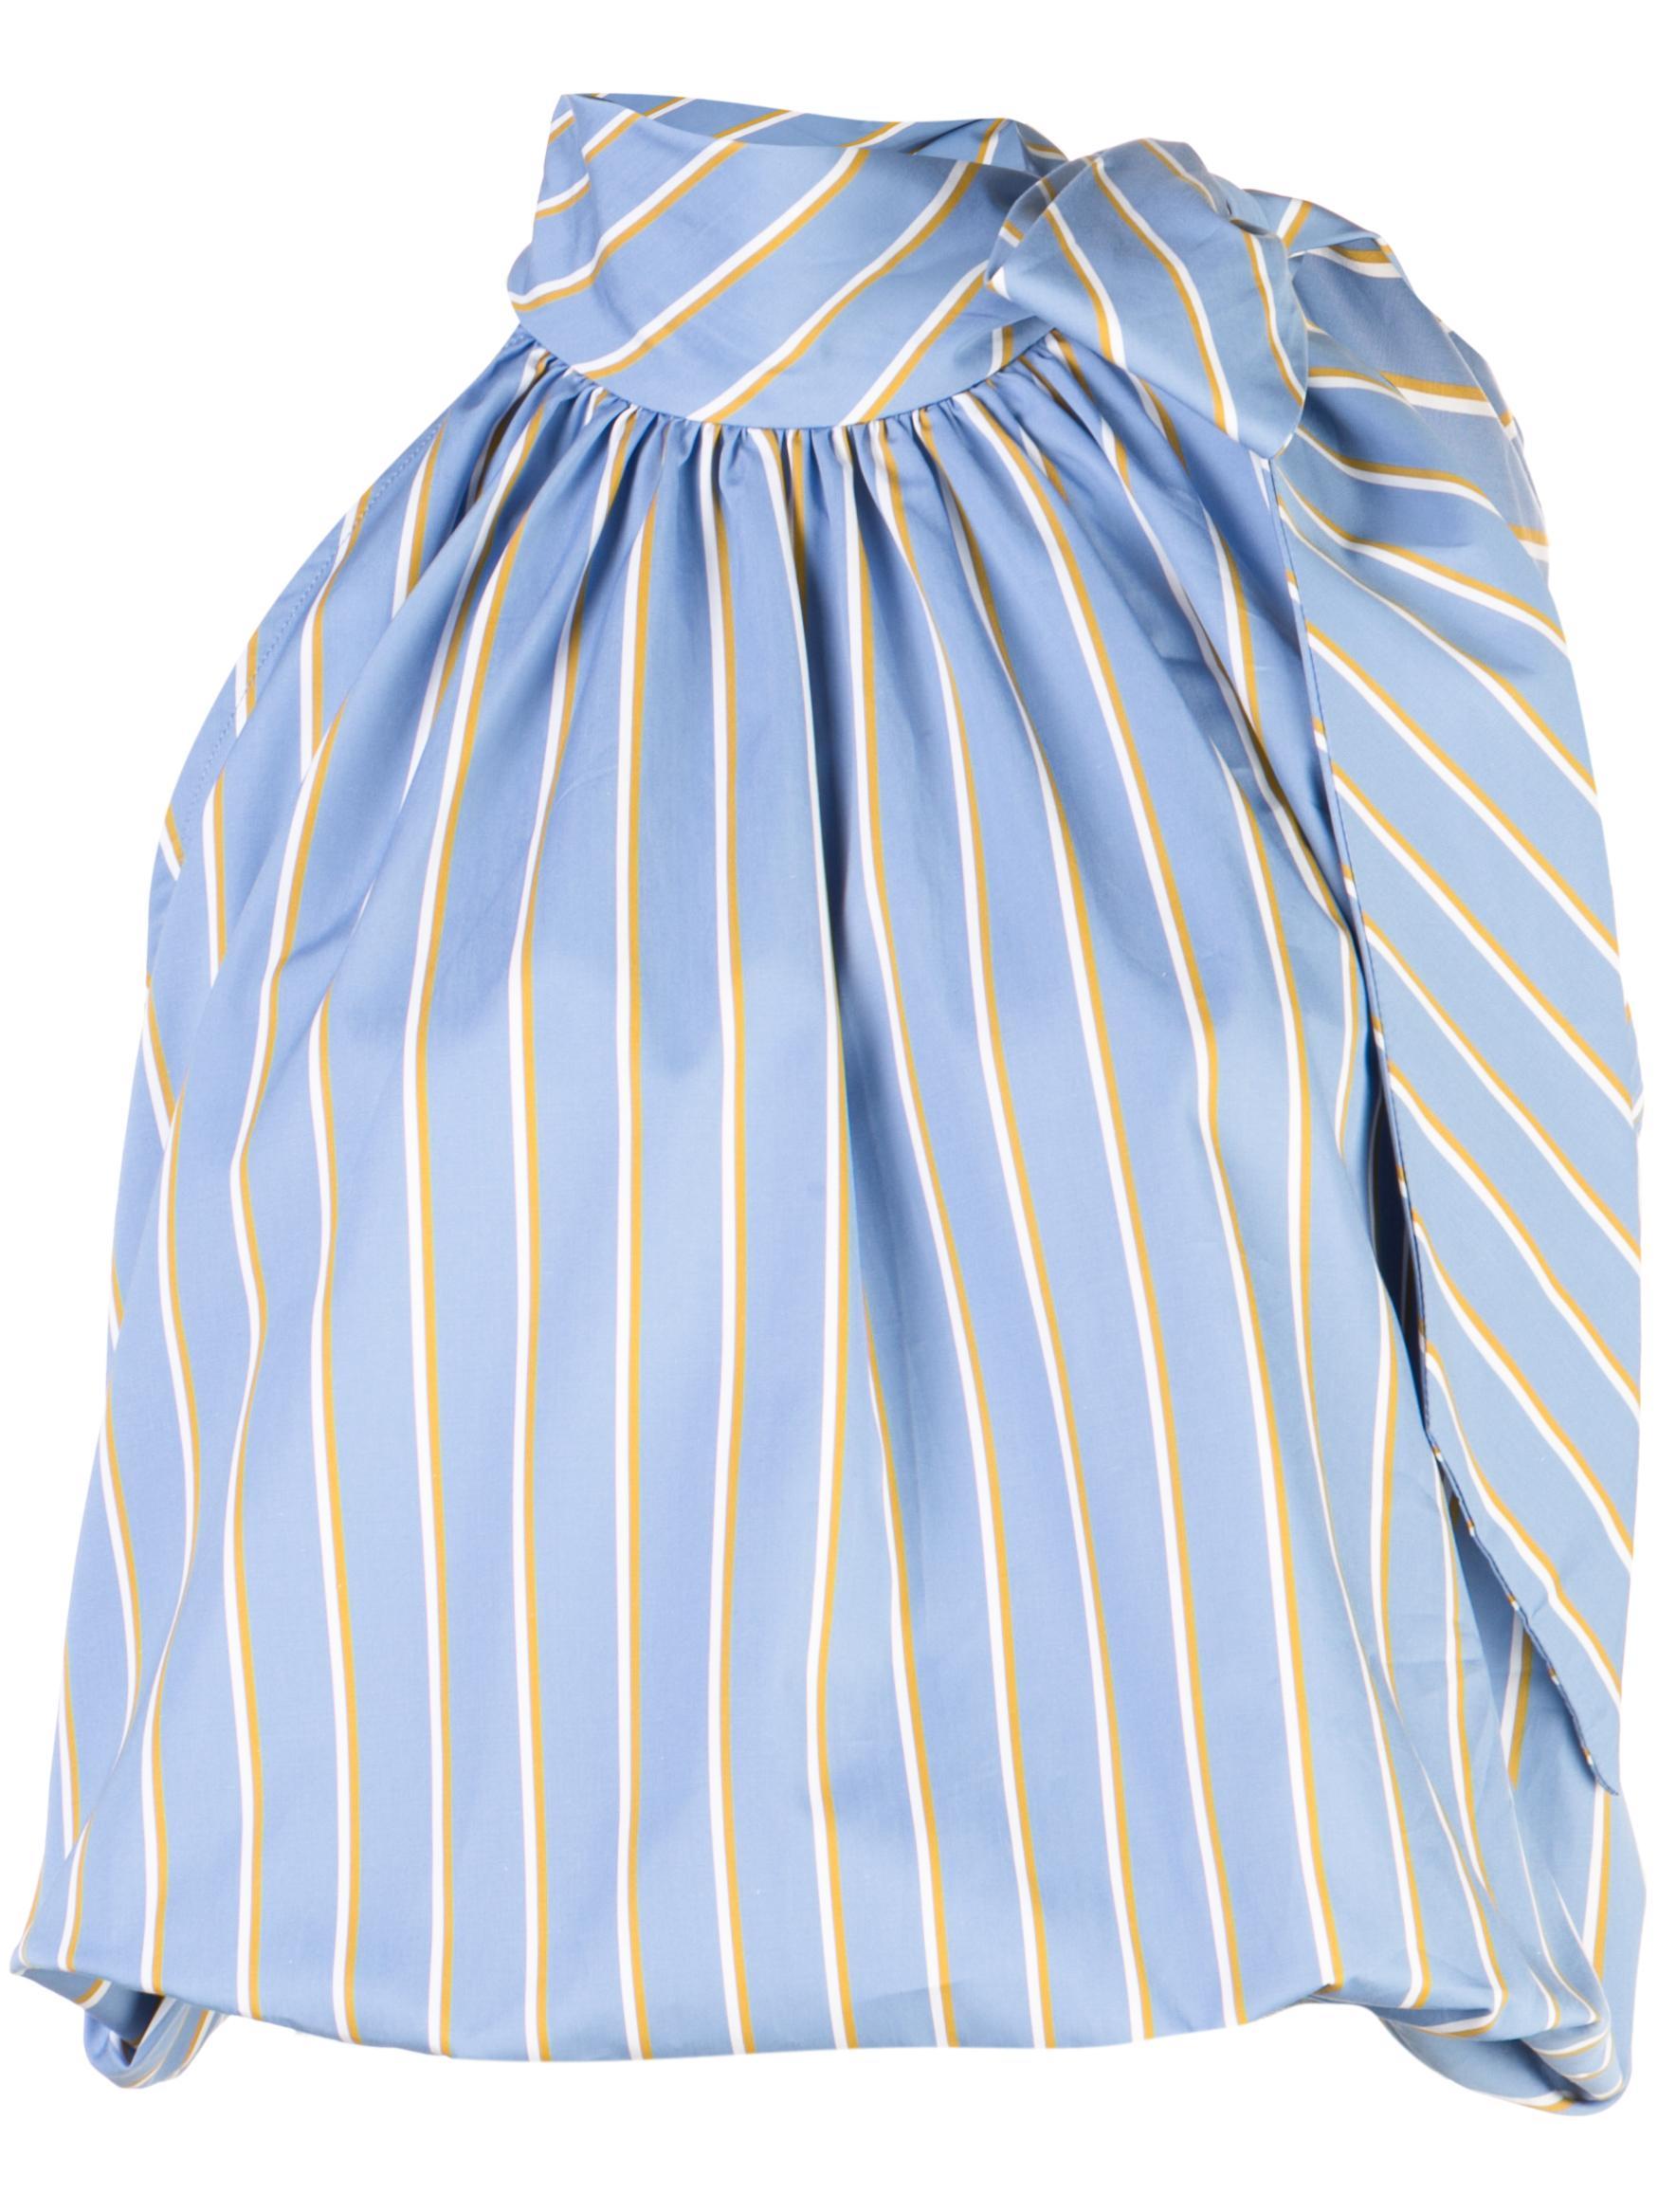 Sleeve Less Stripe Blouse With Neck Tie Item # ACINETA-BLOUSE